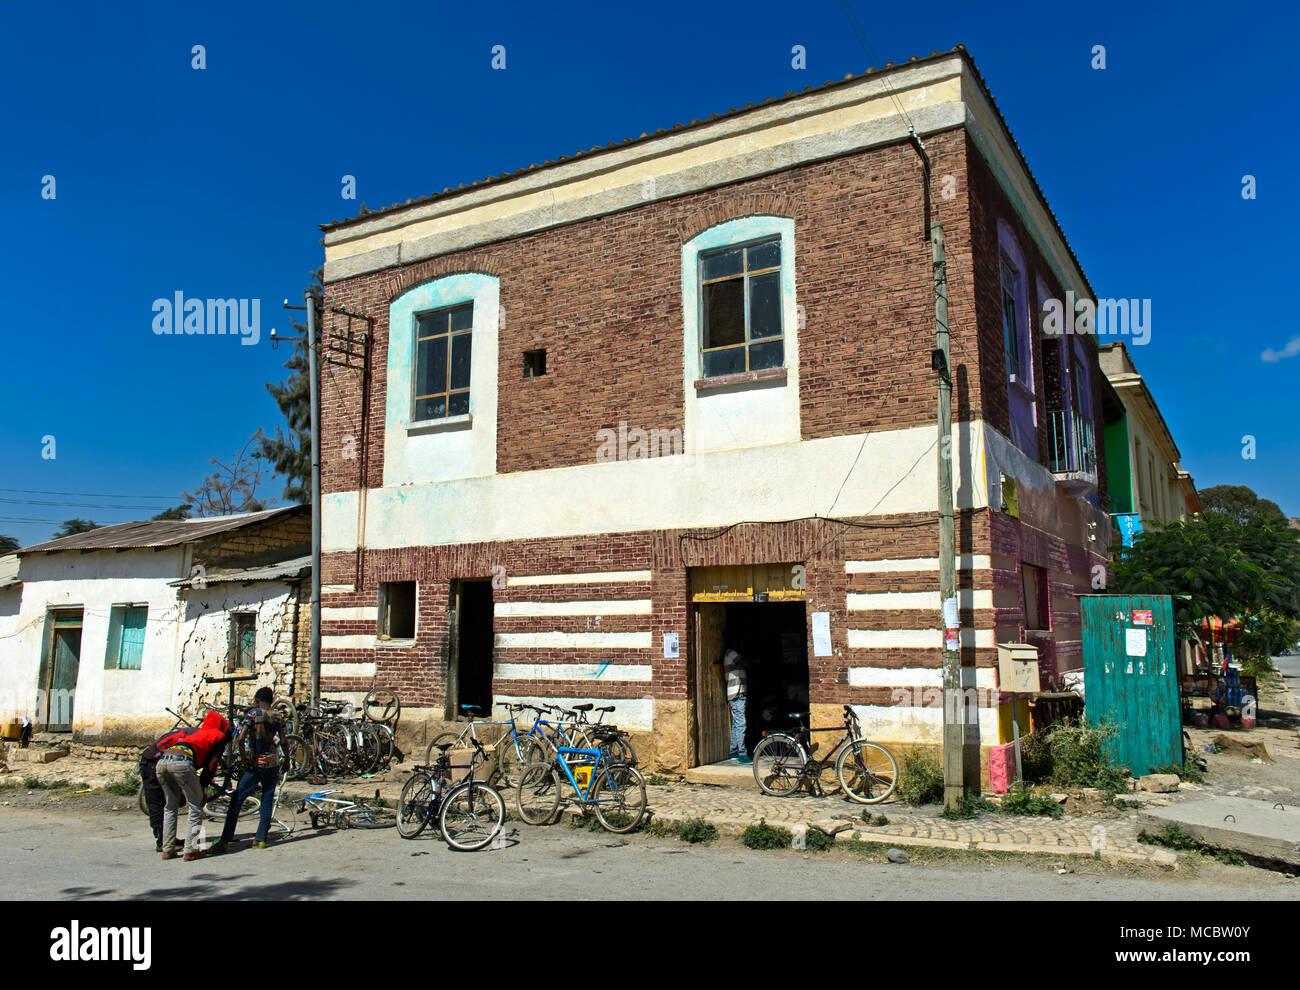 Postal office, Wukro, Tigray region, Ethiopia - Stock Image